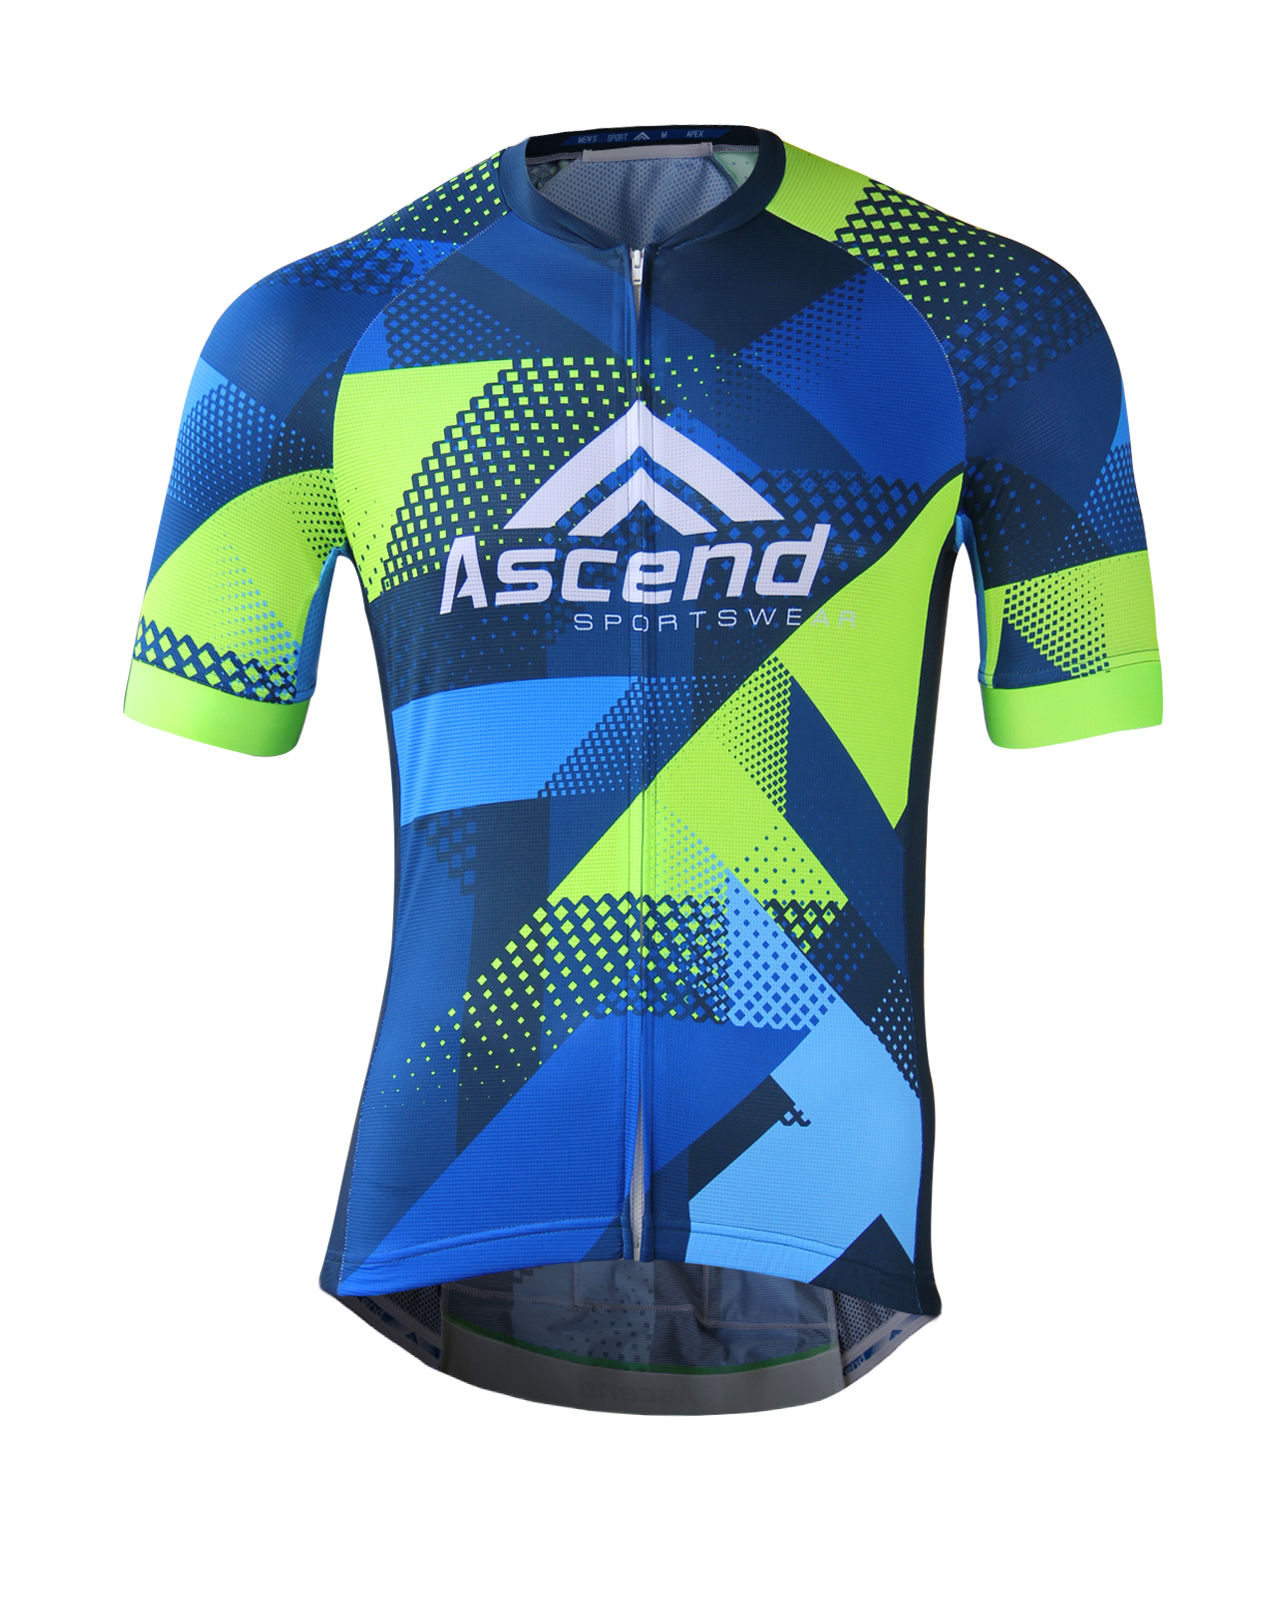 ff327b87141 APEX Custom Cycling Jersey - Ascend Sportswear